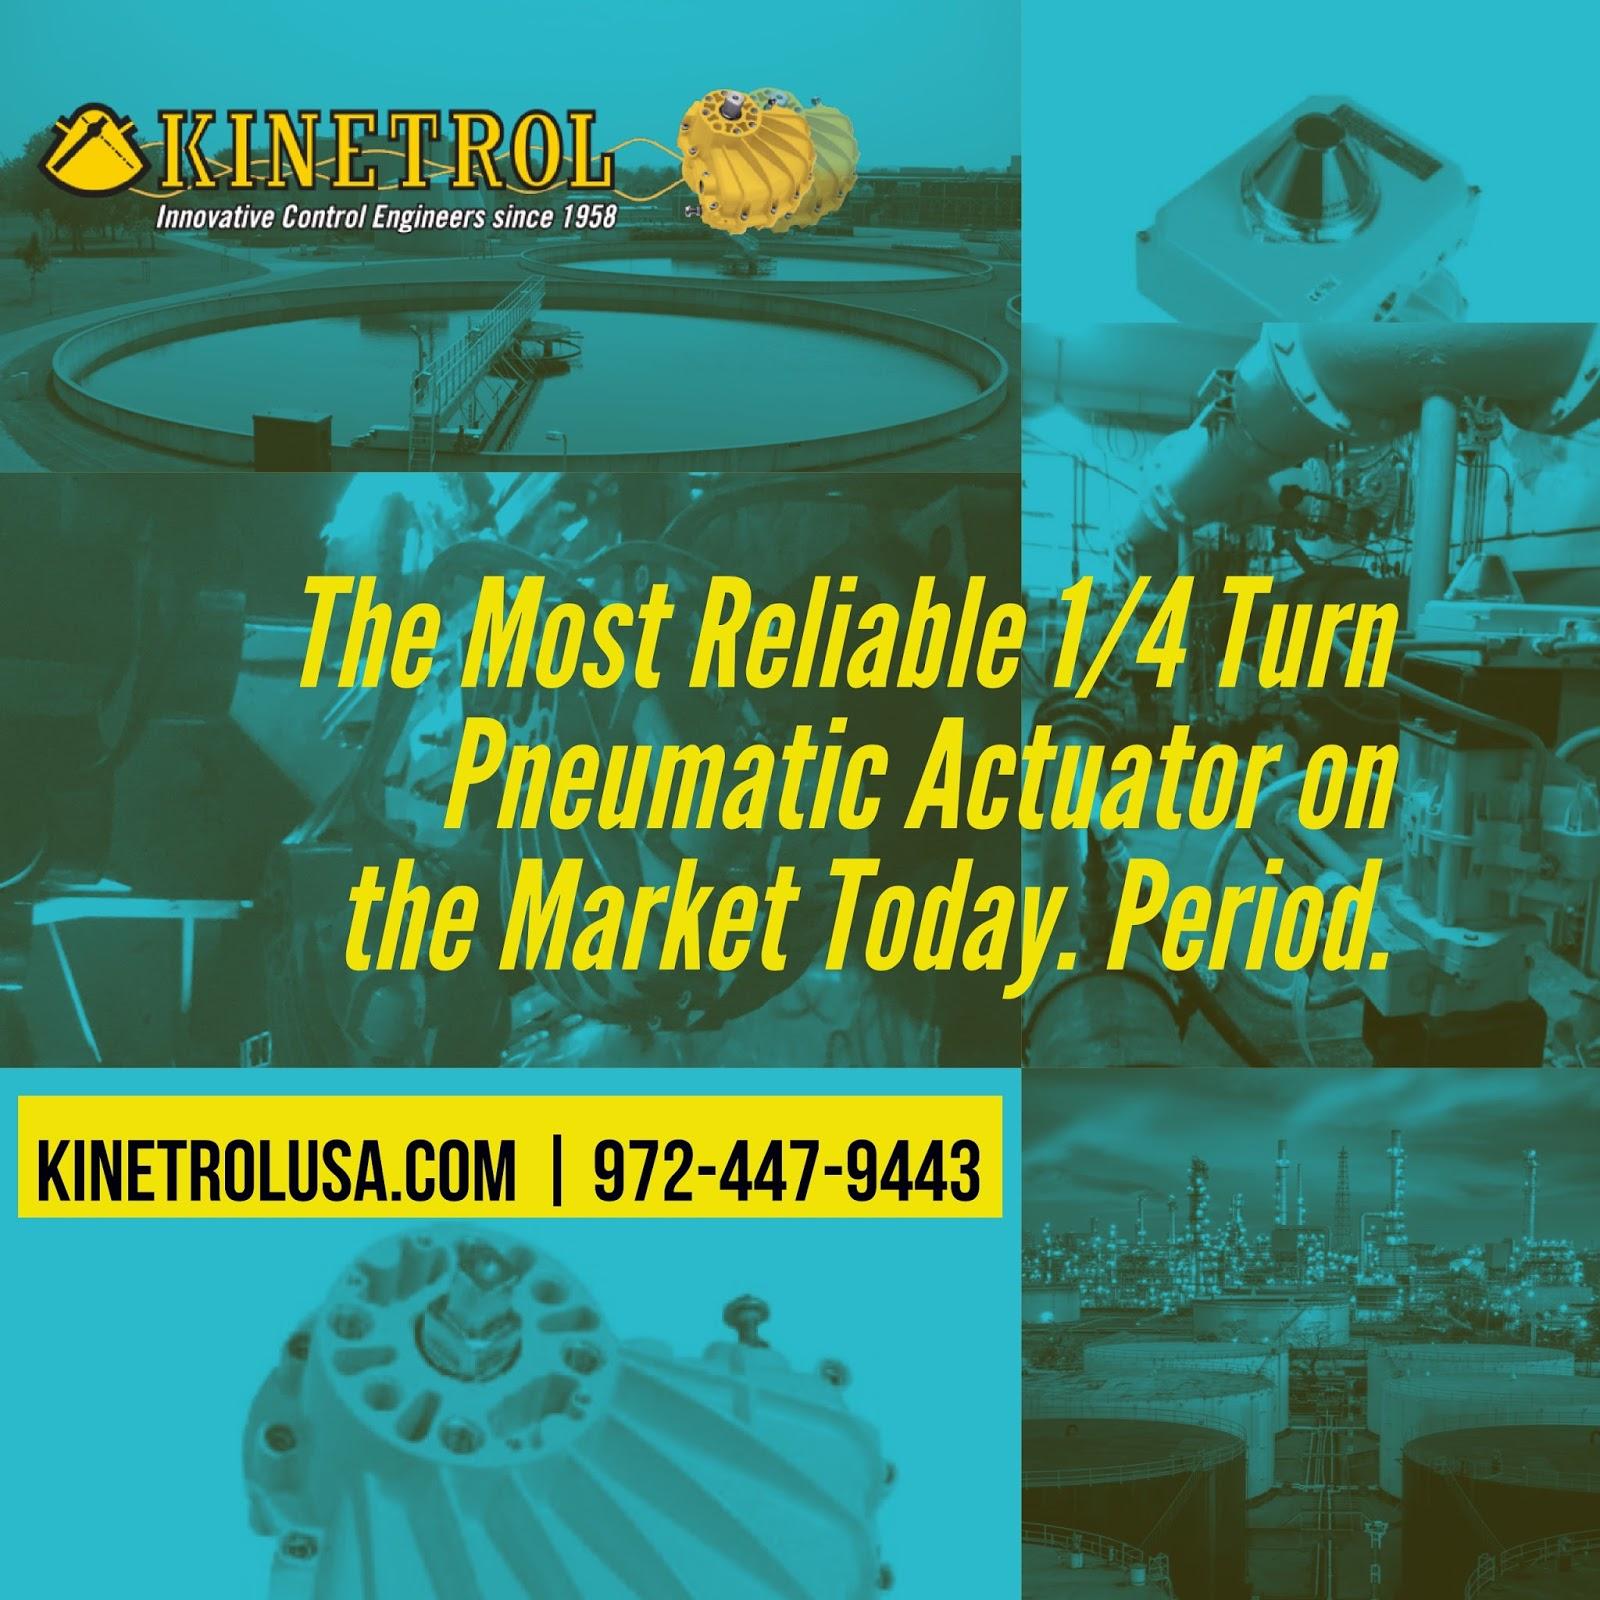 Kinetrol Pneumatic Rotary Vane Actuator Blog: automation